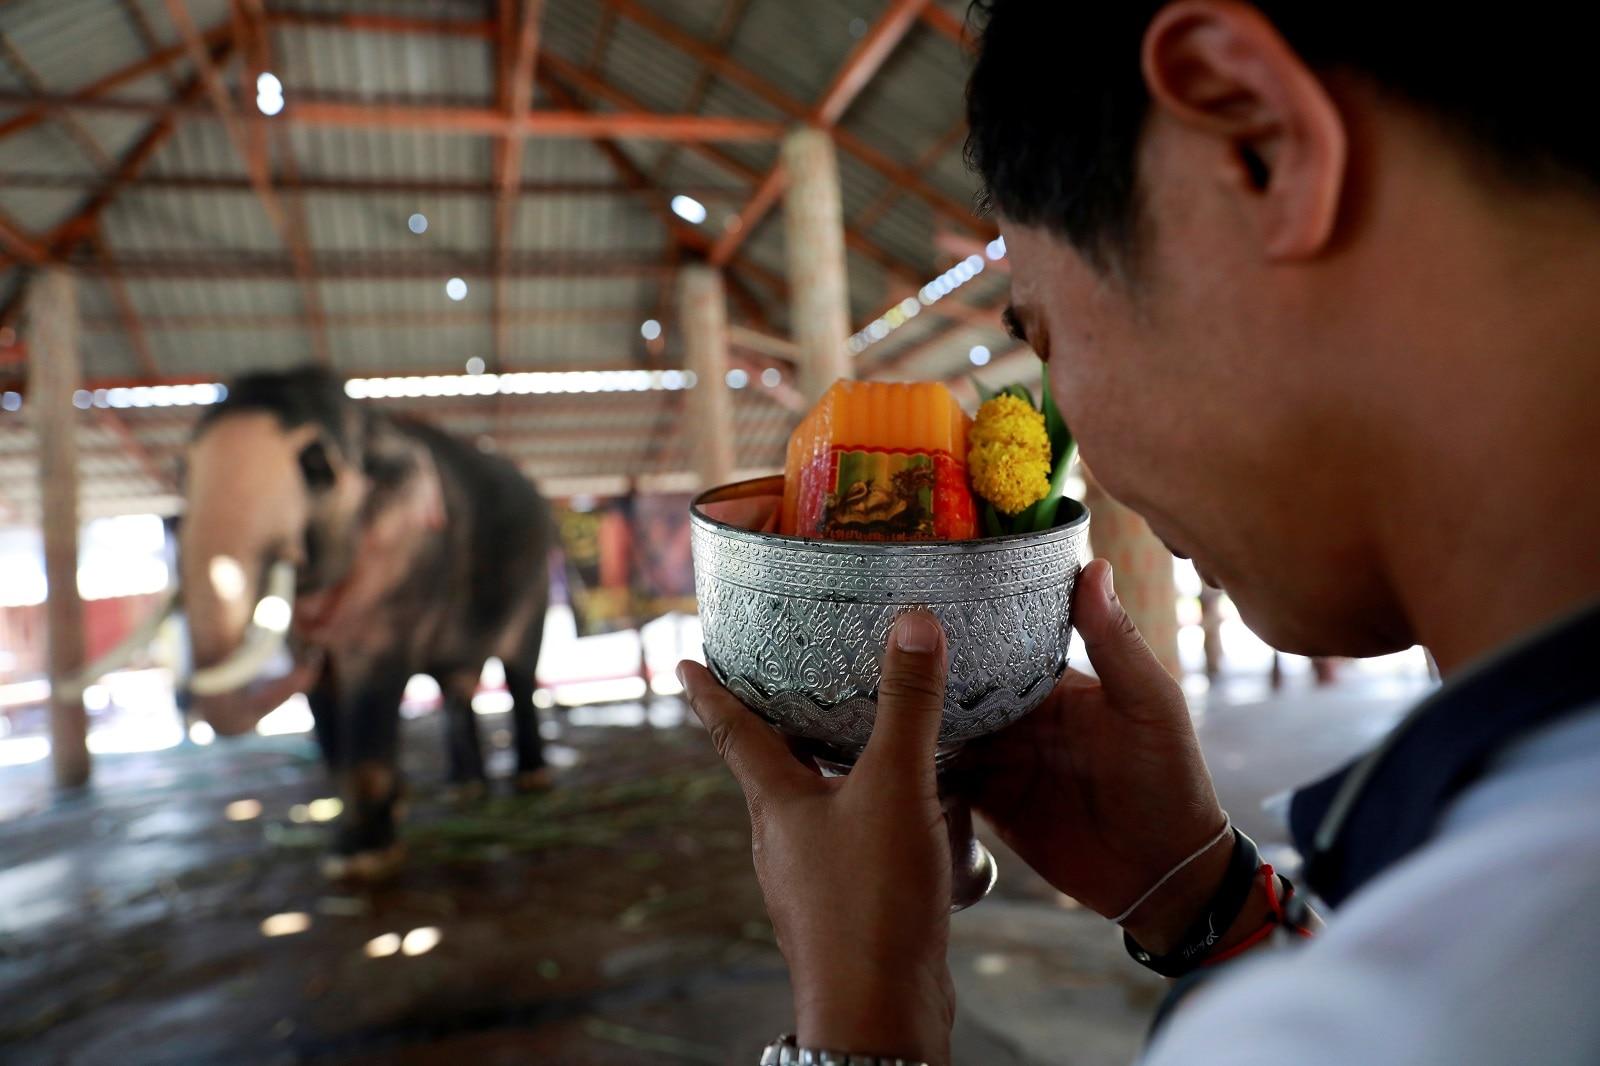 A man makes an offering to Plai Ekachai, 33, in Maha Sarakham, Thailand April 25, 2019. REUTERS/Soe Zeya Tun